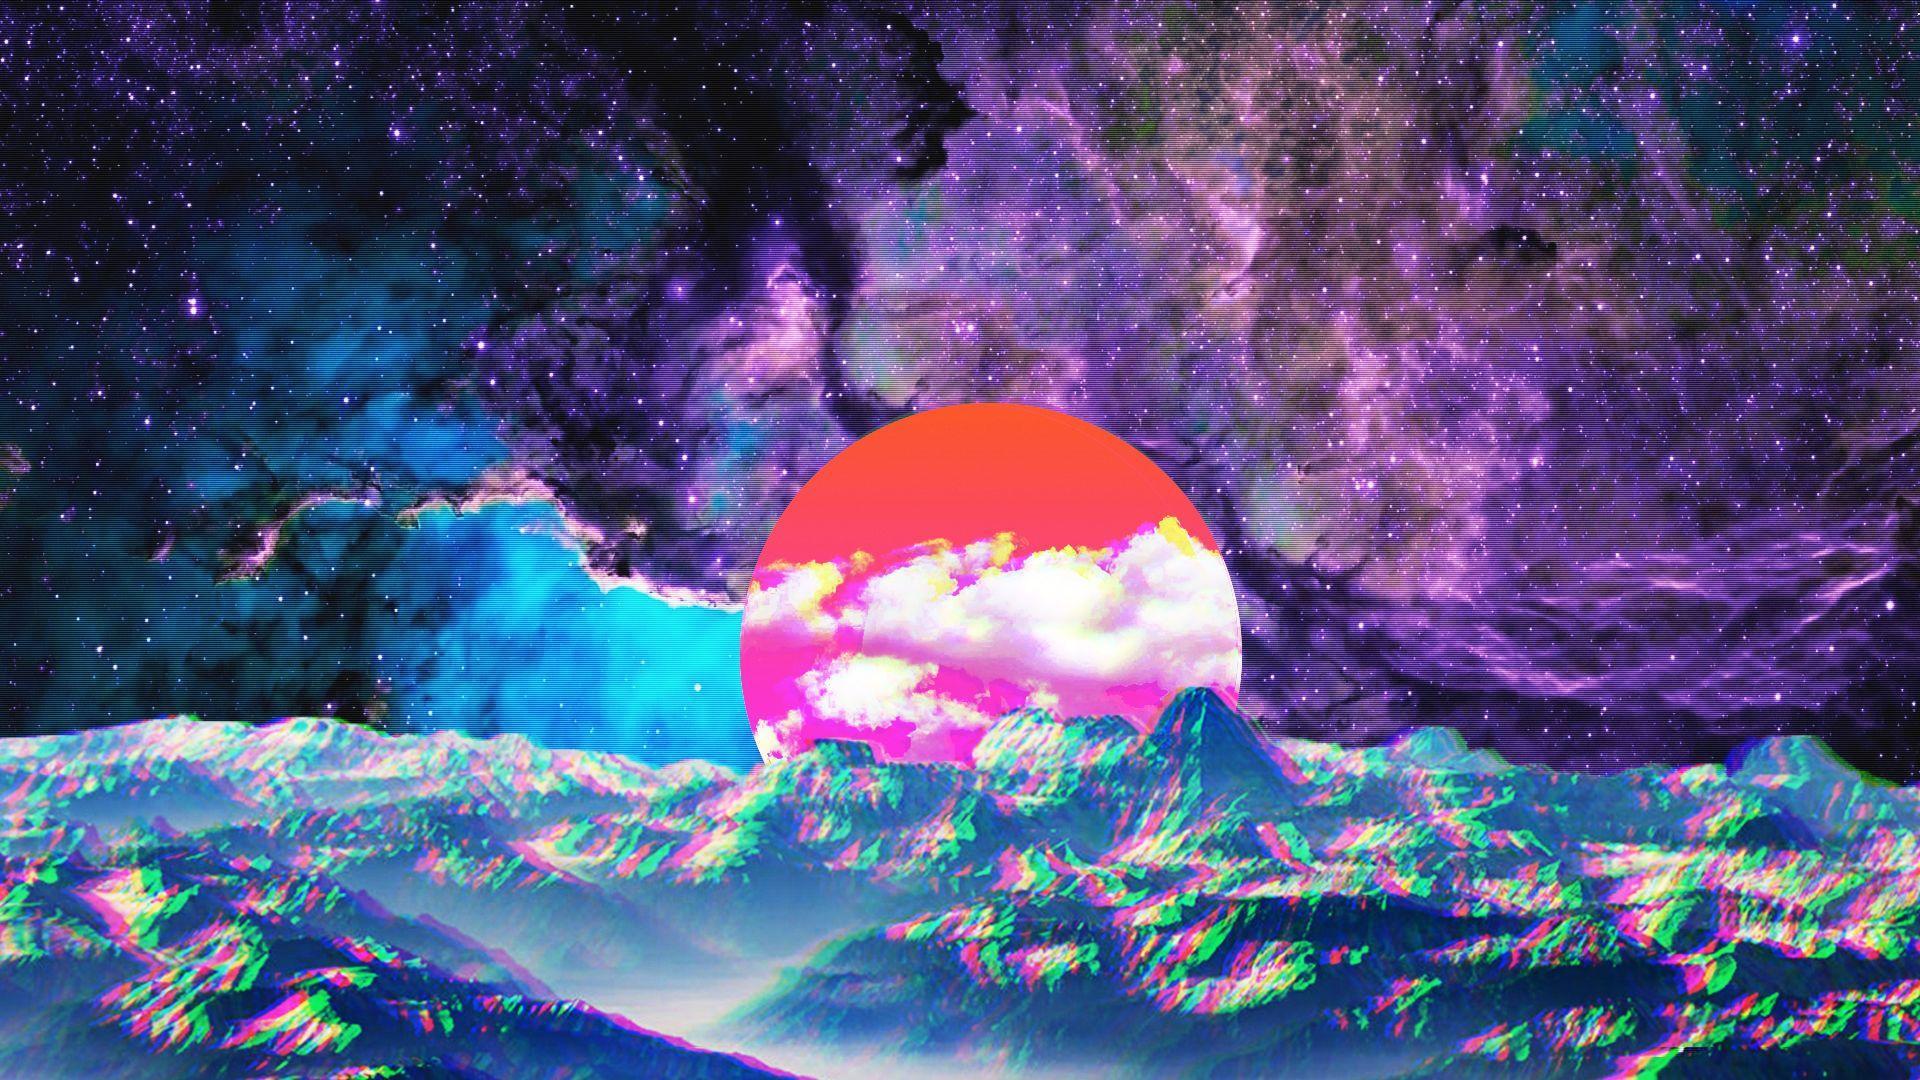 Soft Aesthetic Desktop Wallpapers Wallpaper Cave